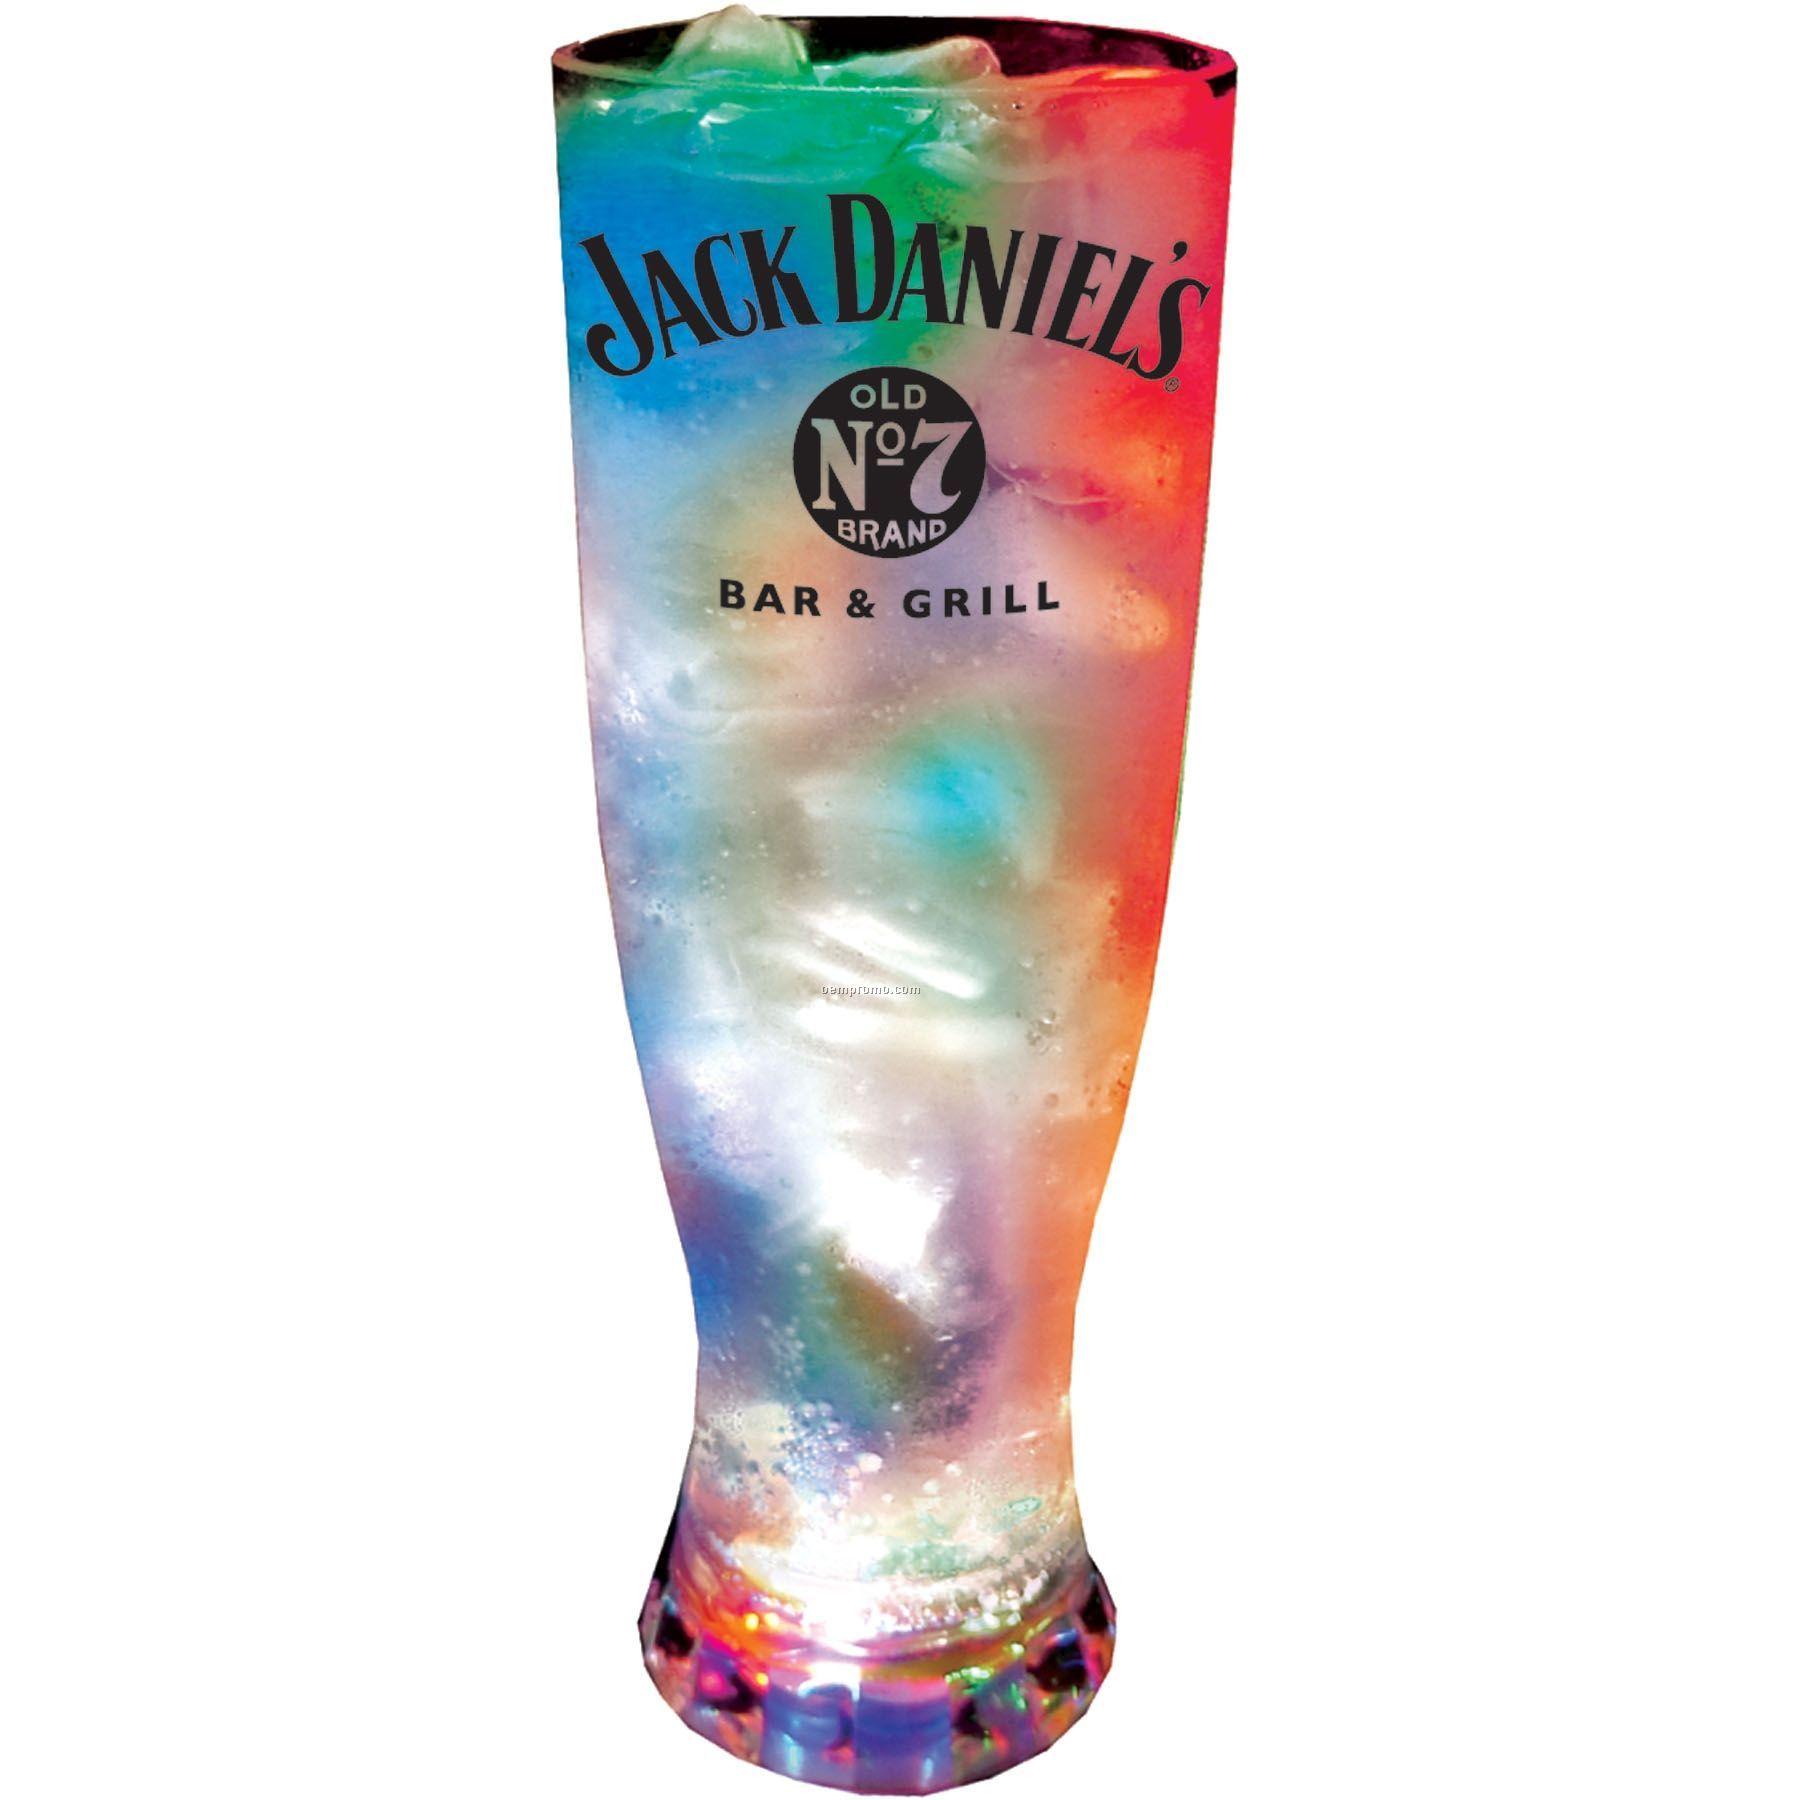 22 Oz. 3-light Pilsner Cup